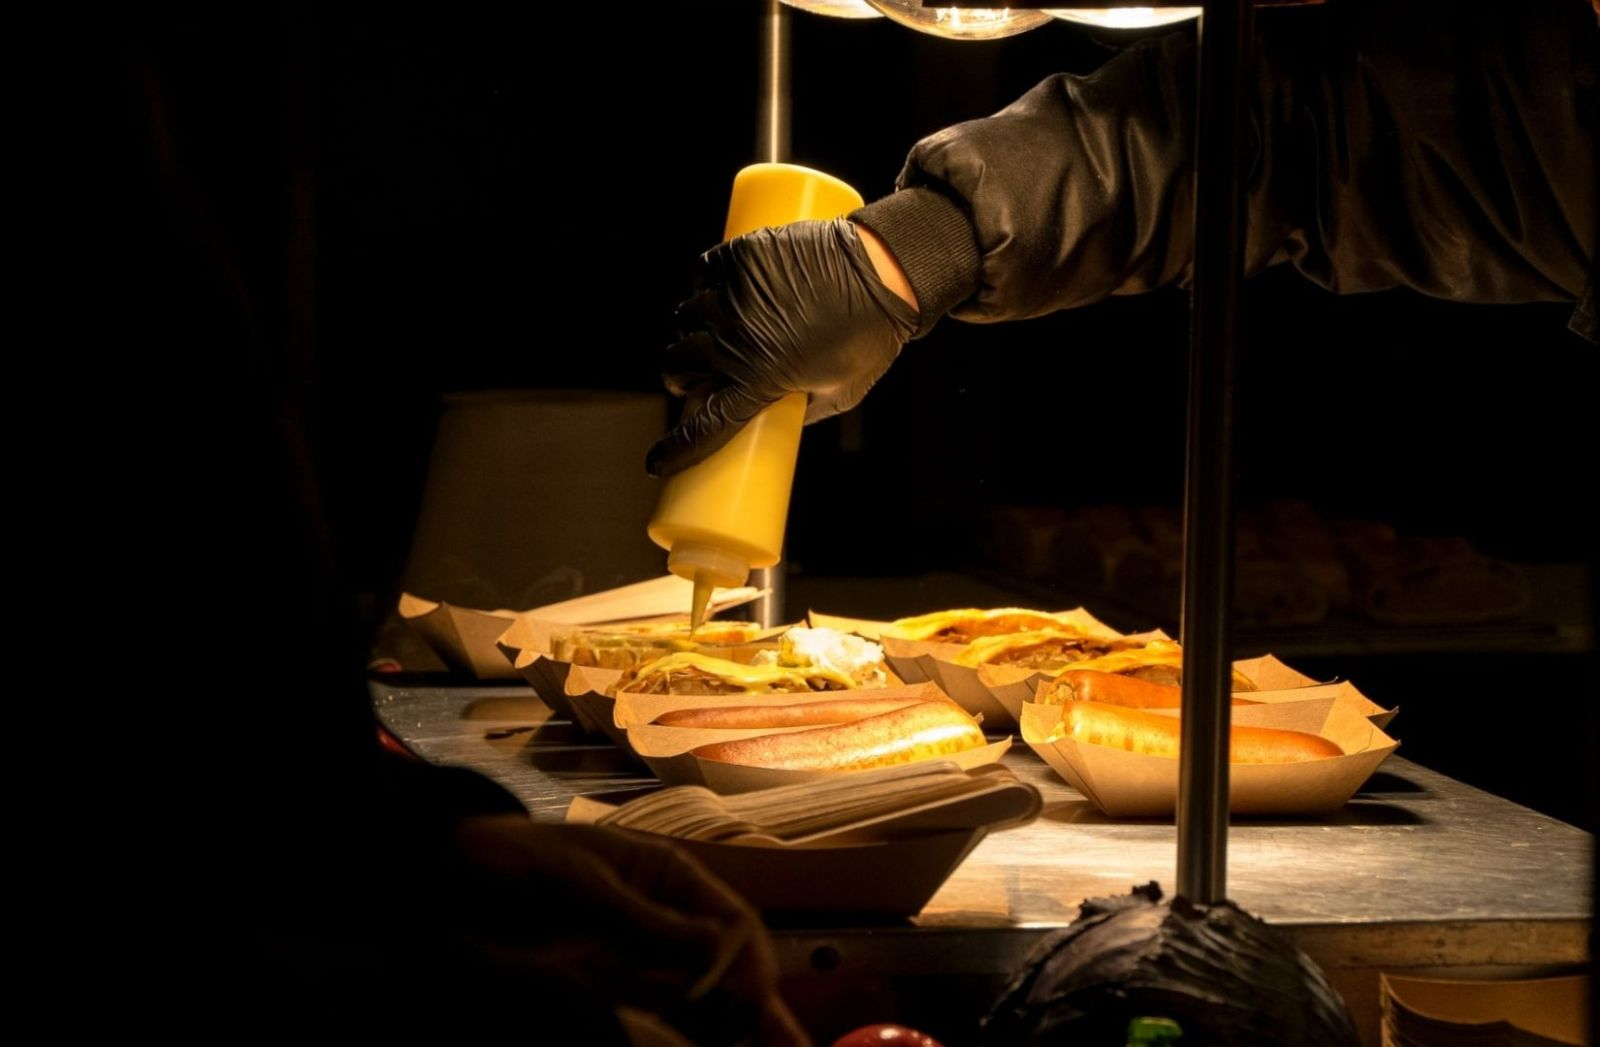 Hot Dogs. (Foto: Thomas Bormans, Unsplash.com)